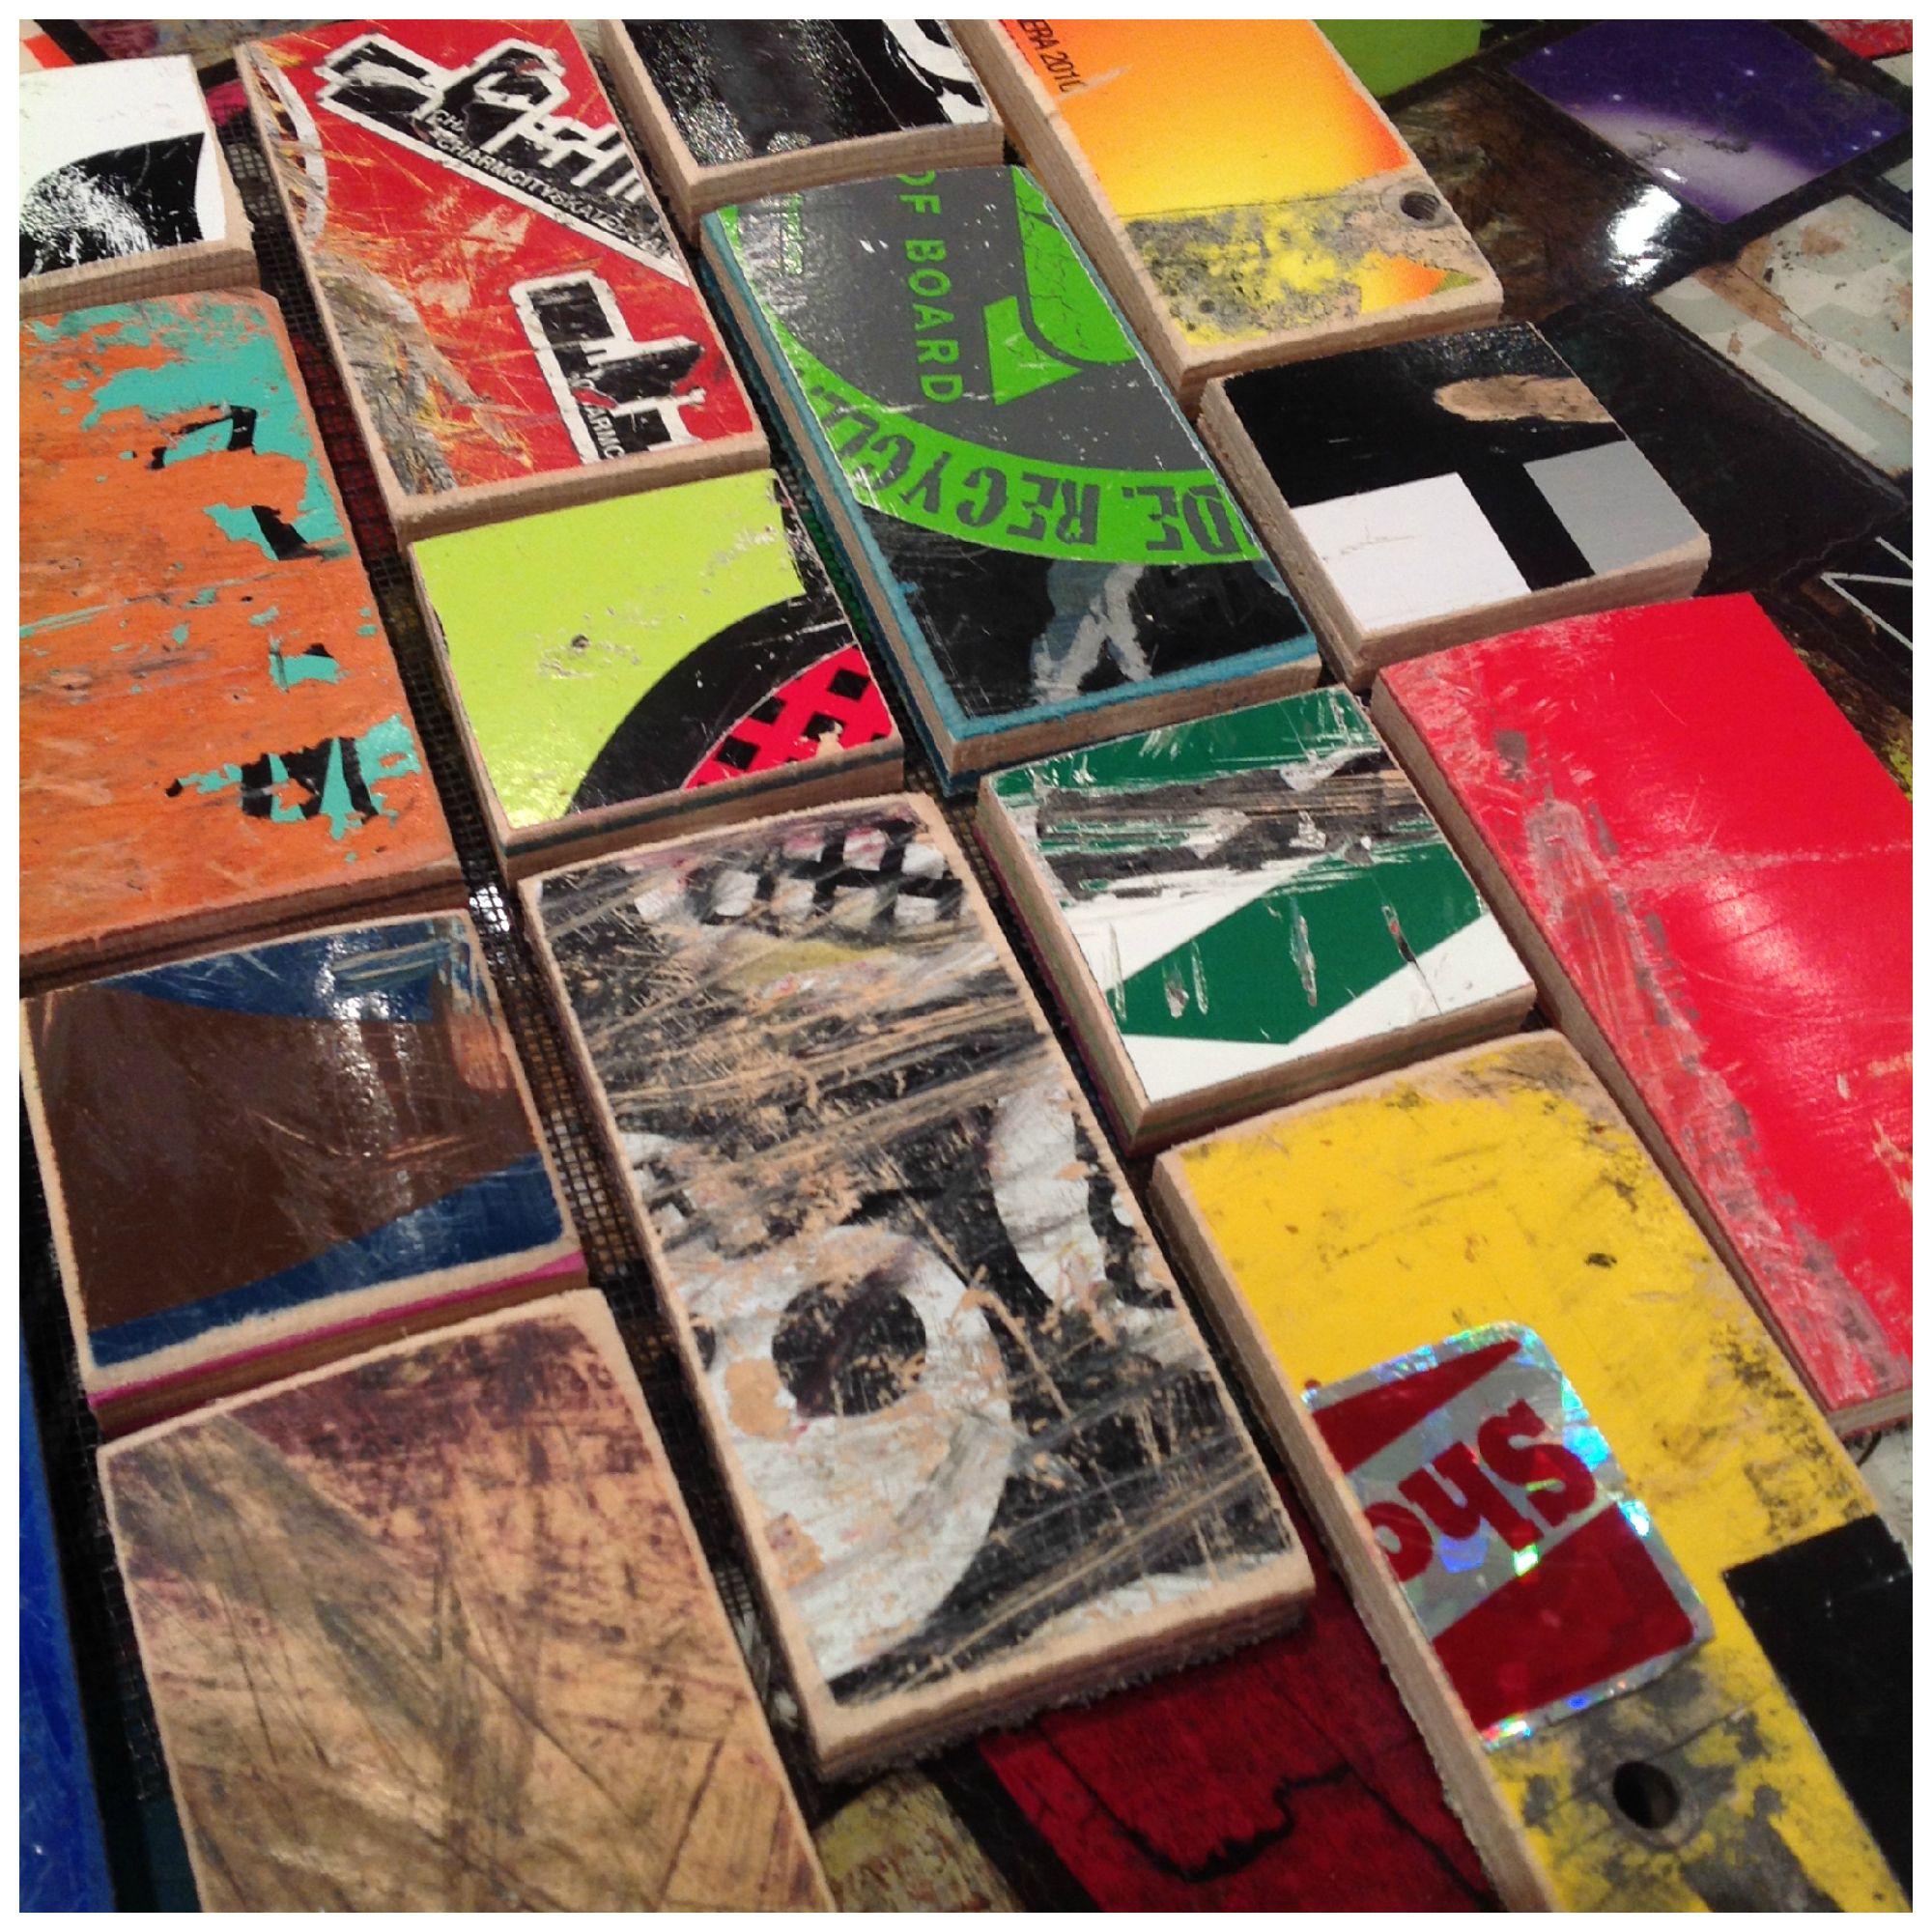 Diy Skateboard Design: Tiles Made Out Of Recycled Skateboards